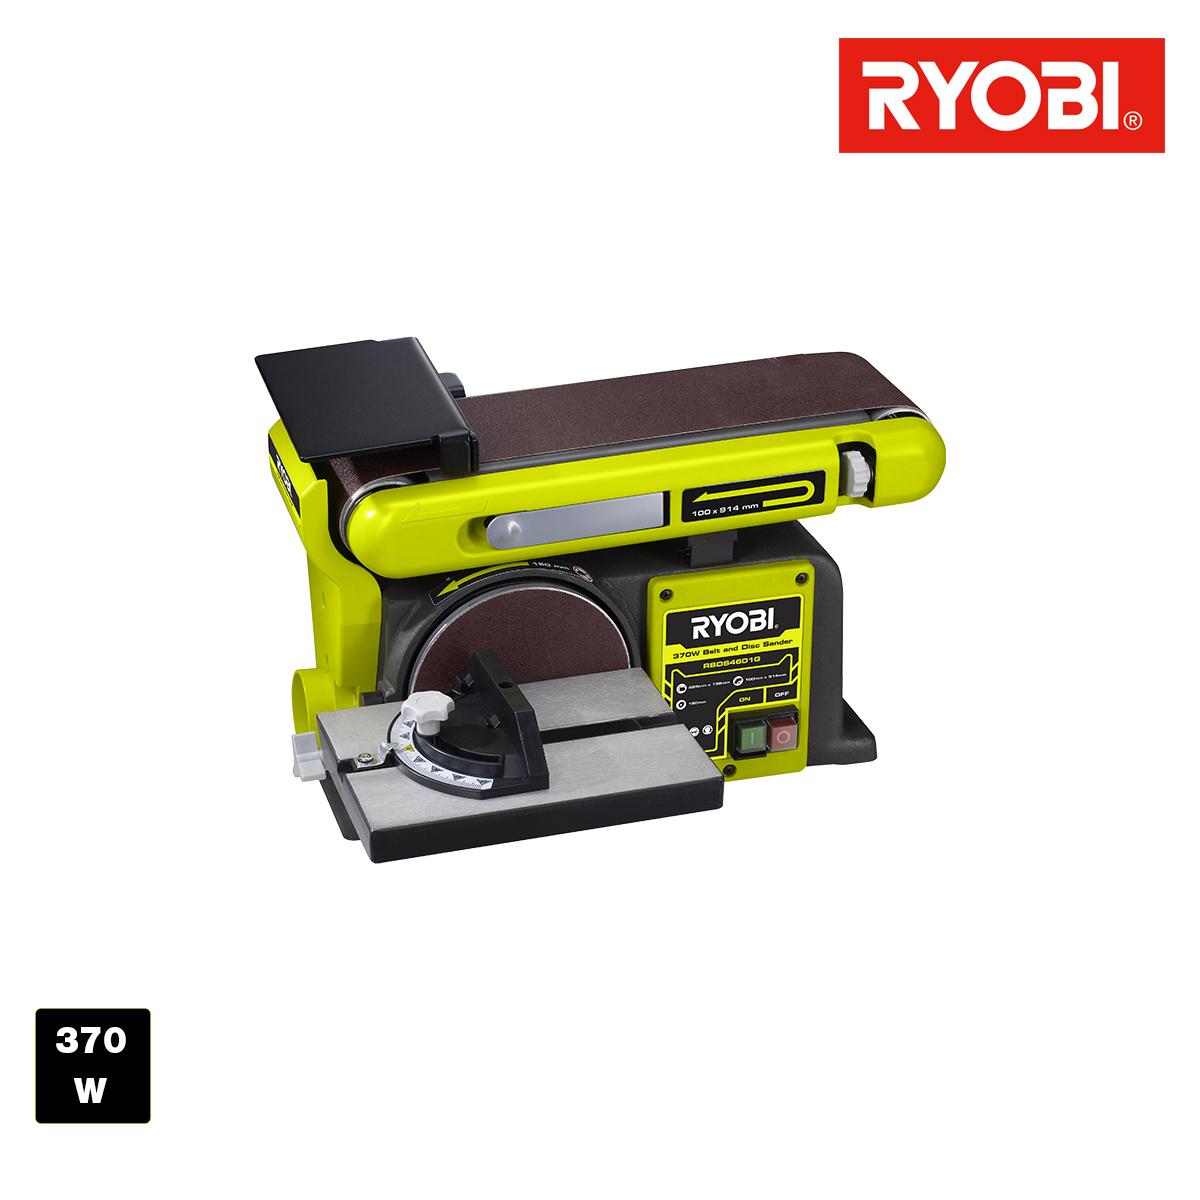 Ryobi ponceuse bande et disque stationnaire 370w rbds4601g distriartisan - Ponceuse stationnaire a bande ...